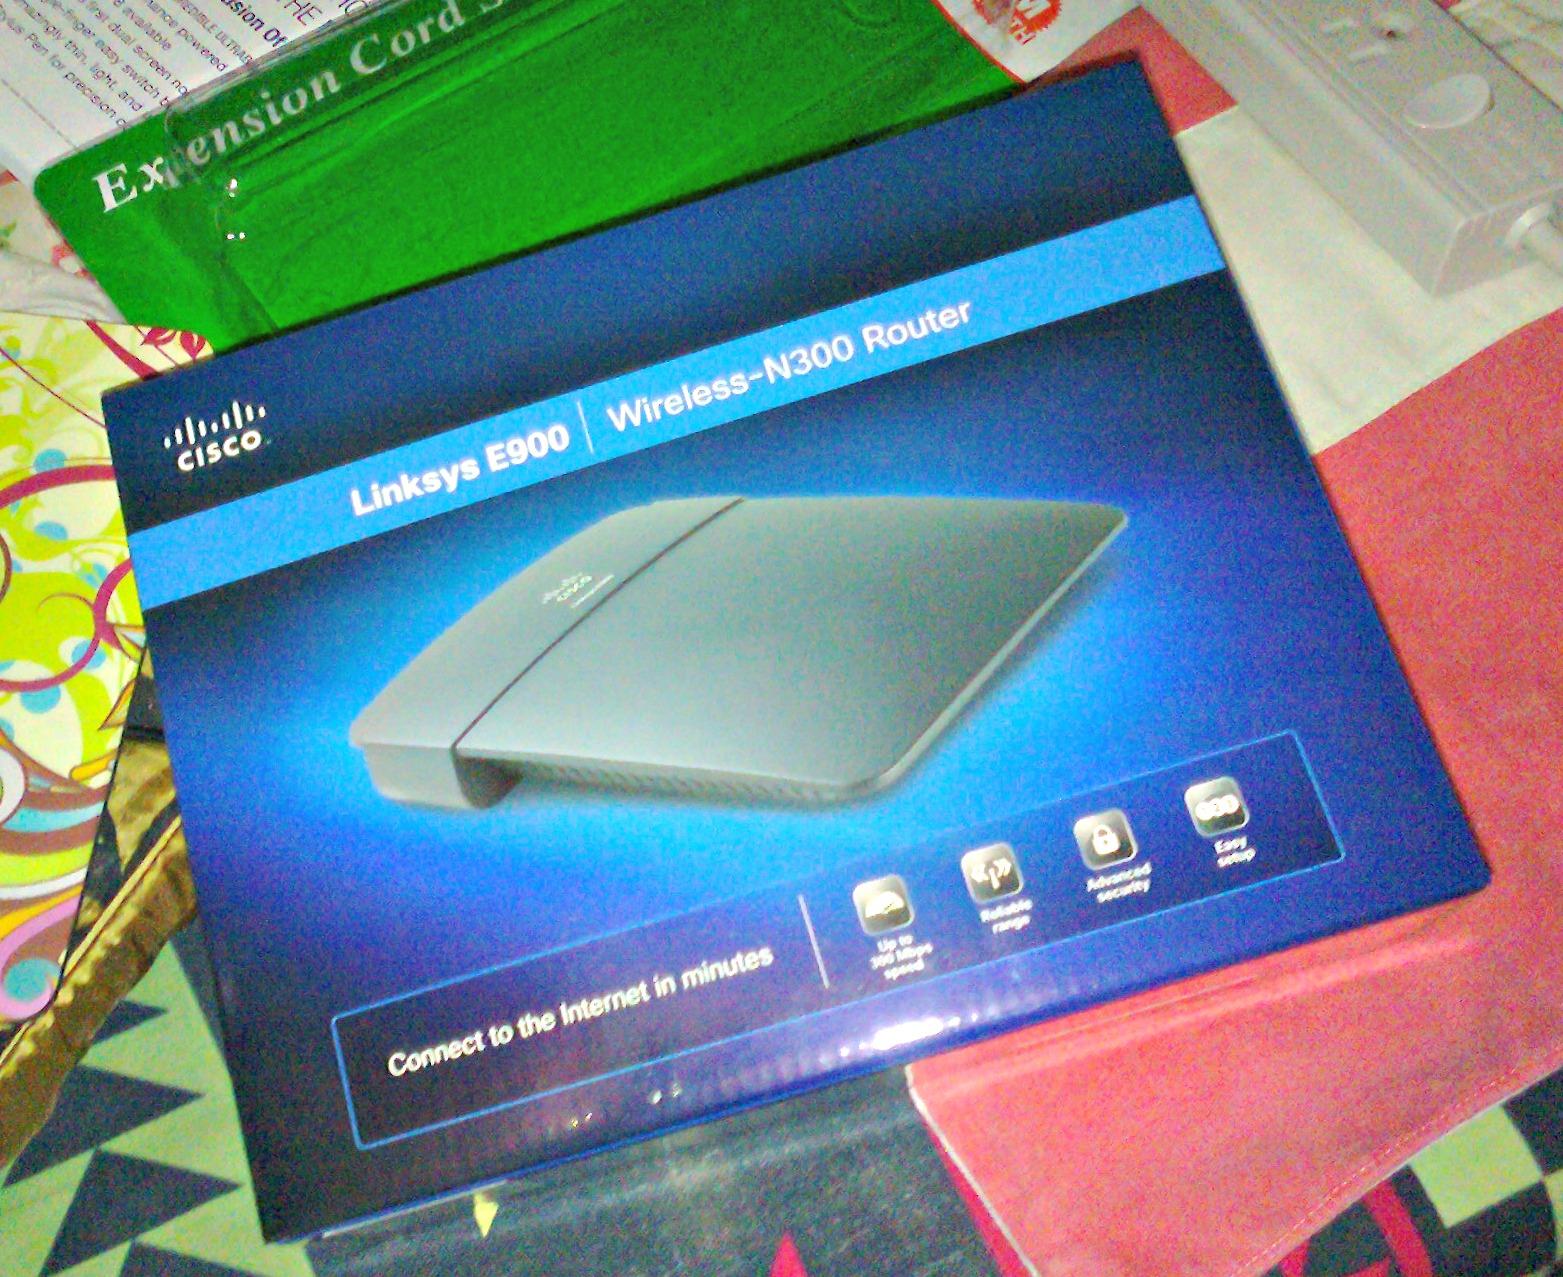 The Stellar Momi: Cisco Linksys E900 Wireless-N300 Router